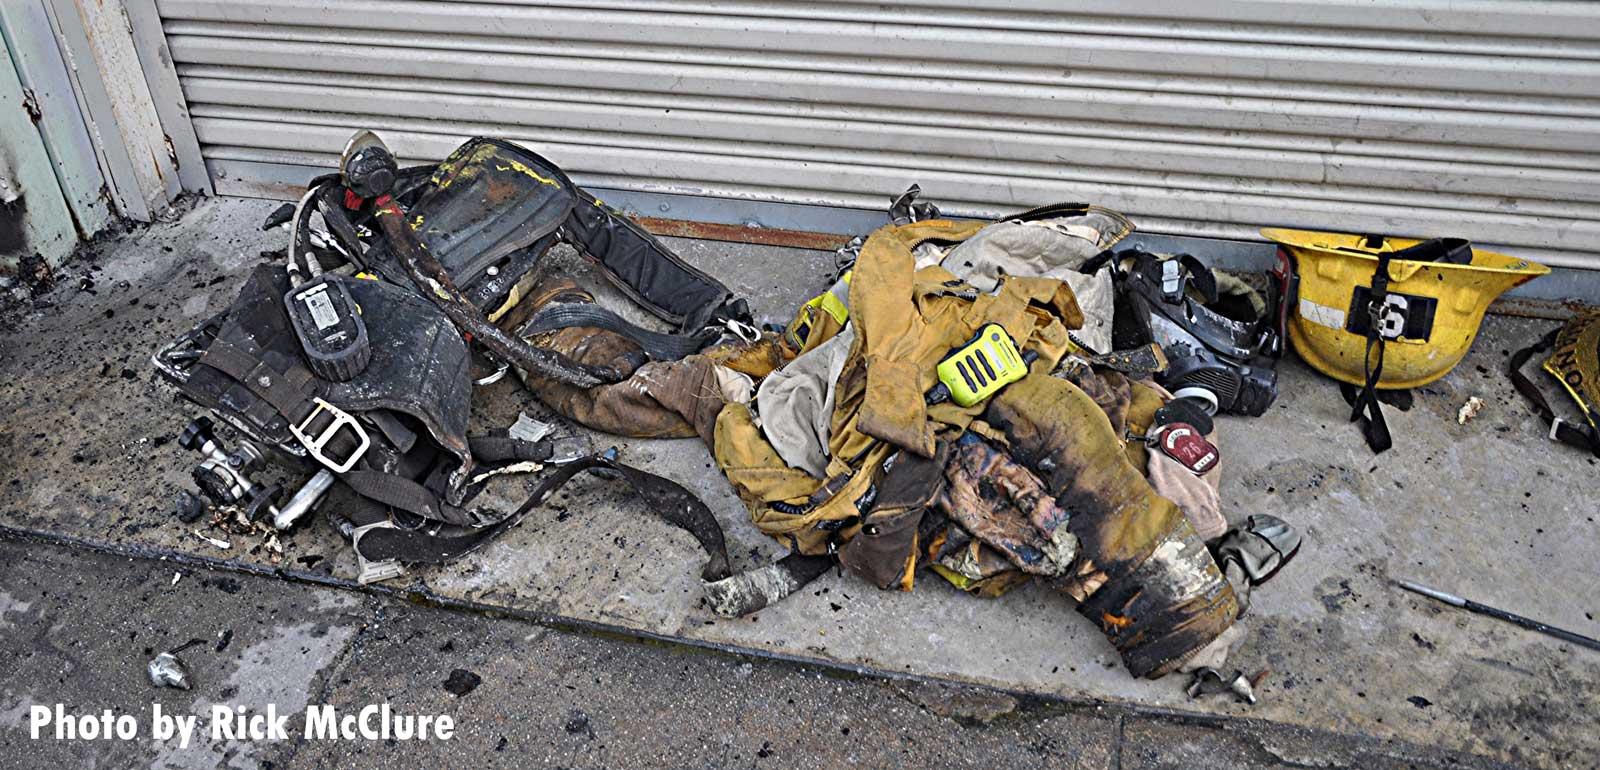 Damaged fire gear